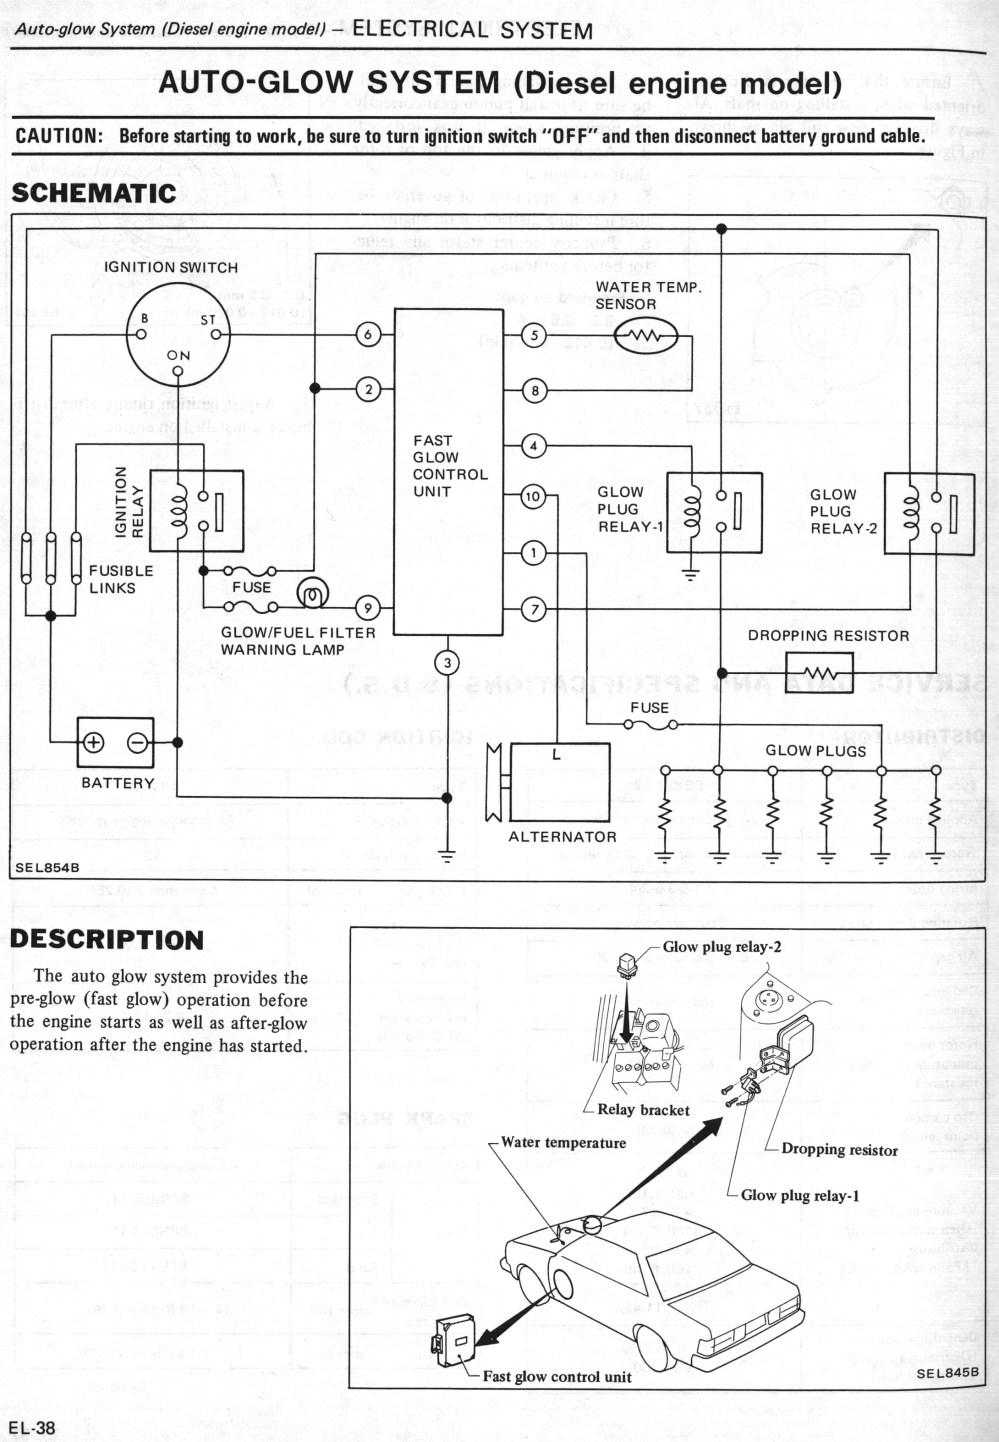 medium resolution of 280zx dash wiring diagram wiring library280zx wiring diagram cas search for wiring diagrams u2022